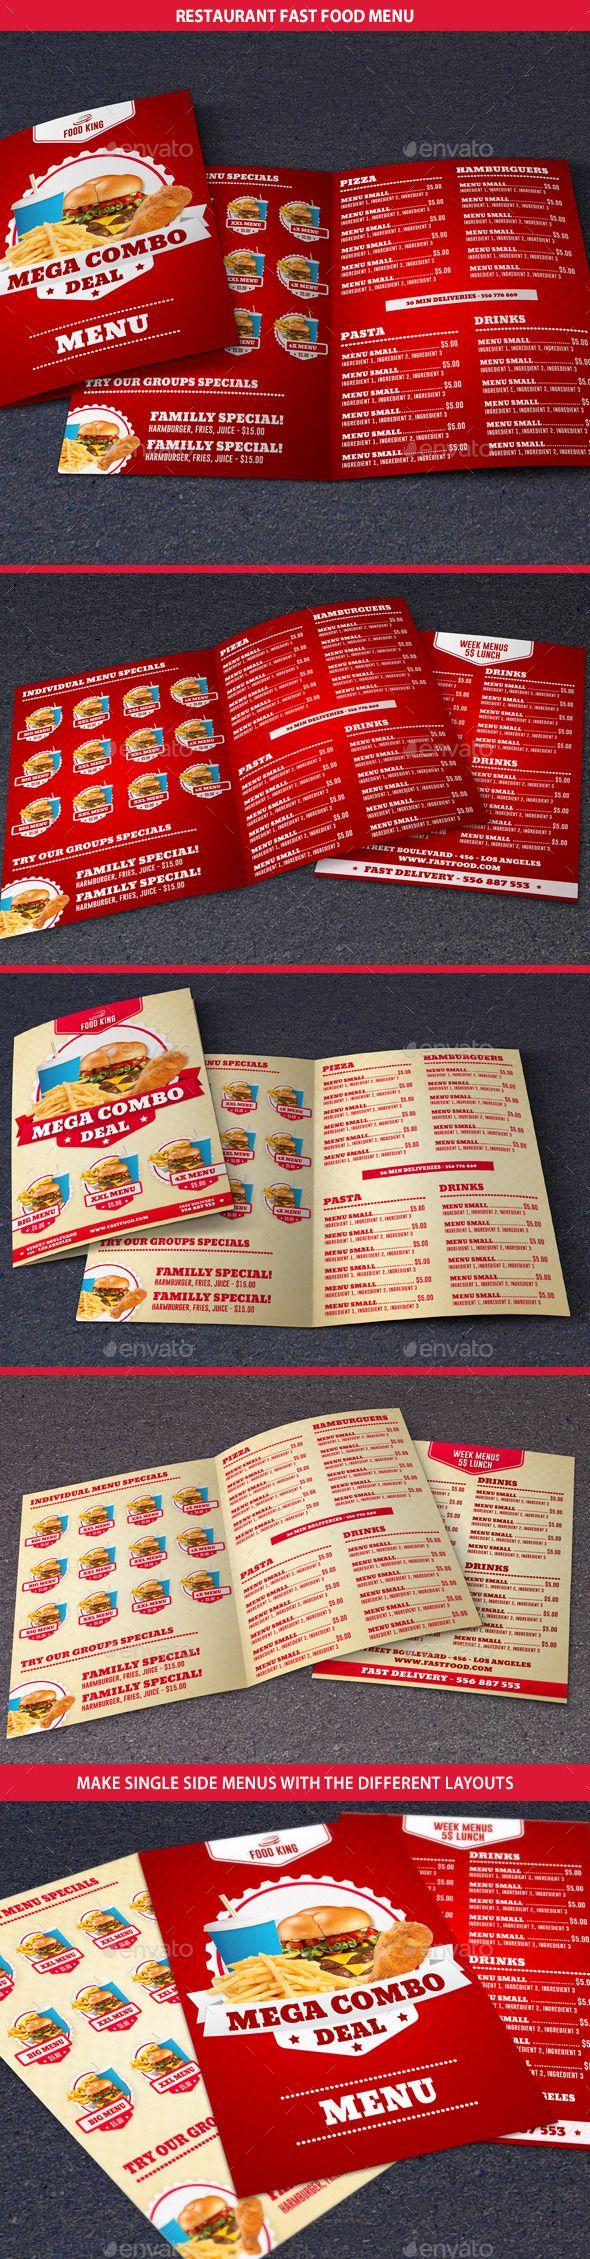 Restaurant Fast Food Menu - Food Menus Print Templates Download here : https://graphicriver.net/item/restaurant-fast-food-menu/10412250?s_rank=905&ref=Al-fatih